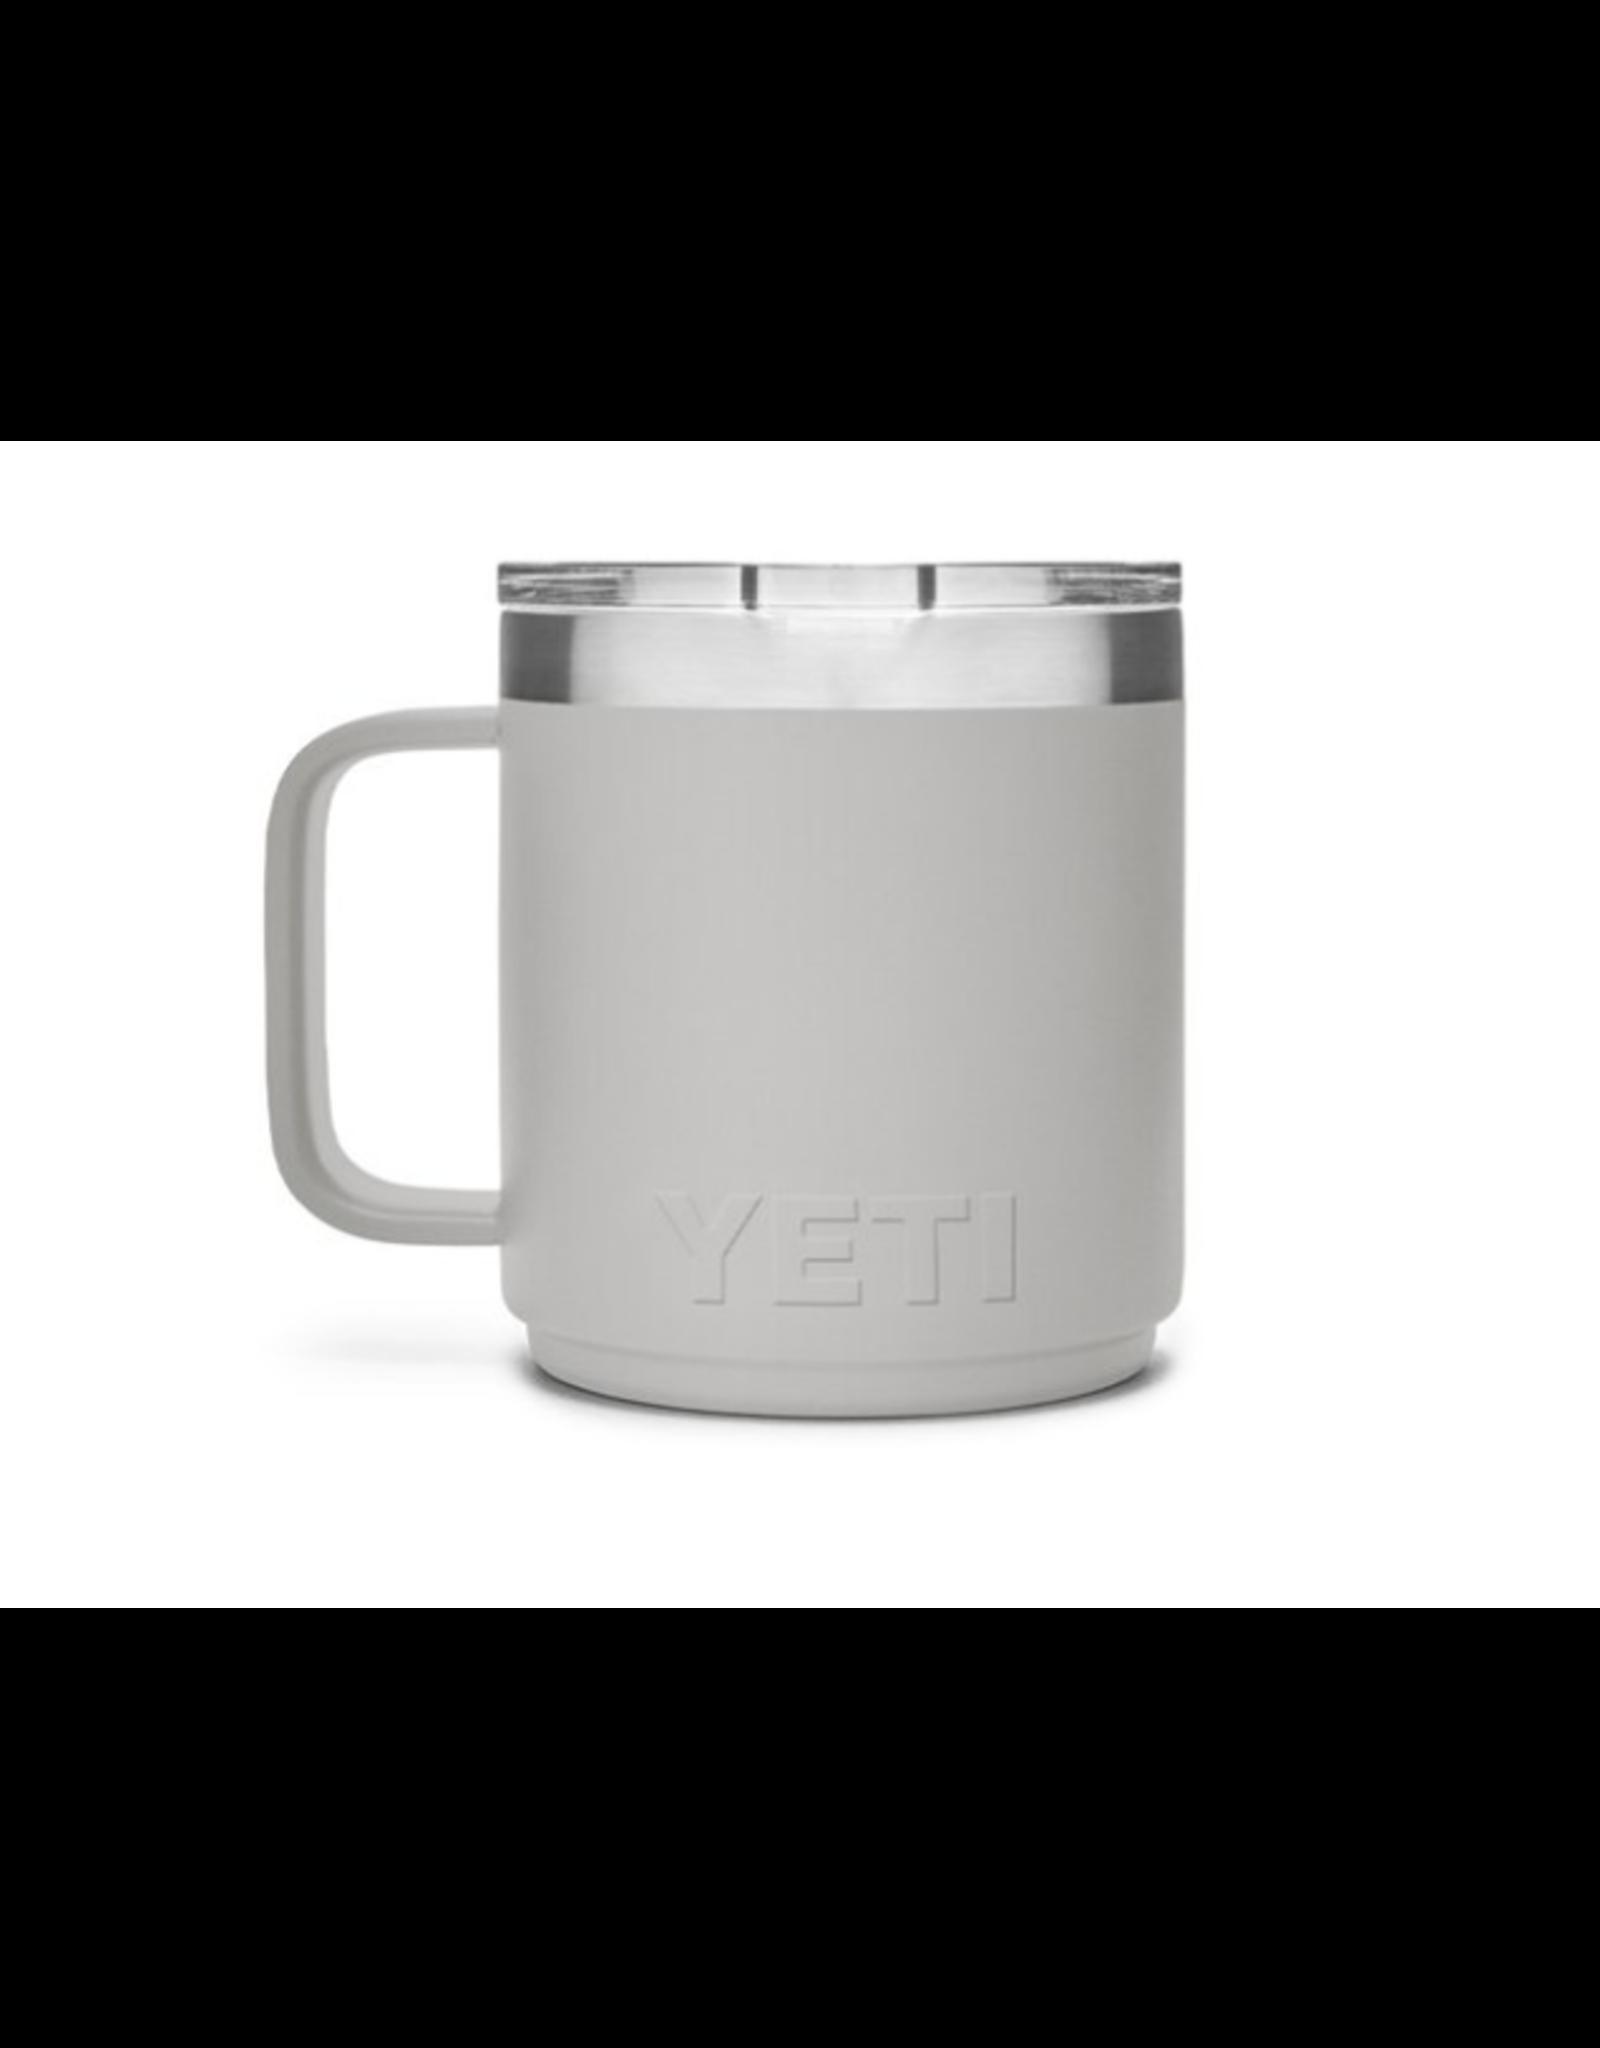 Yeti Rambler 10 Mug Granite Gray